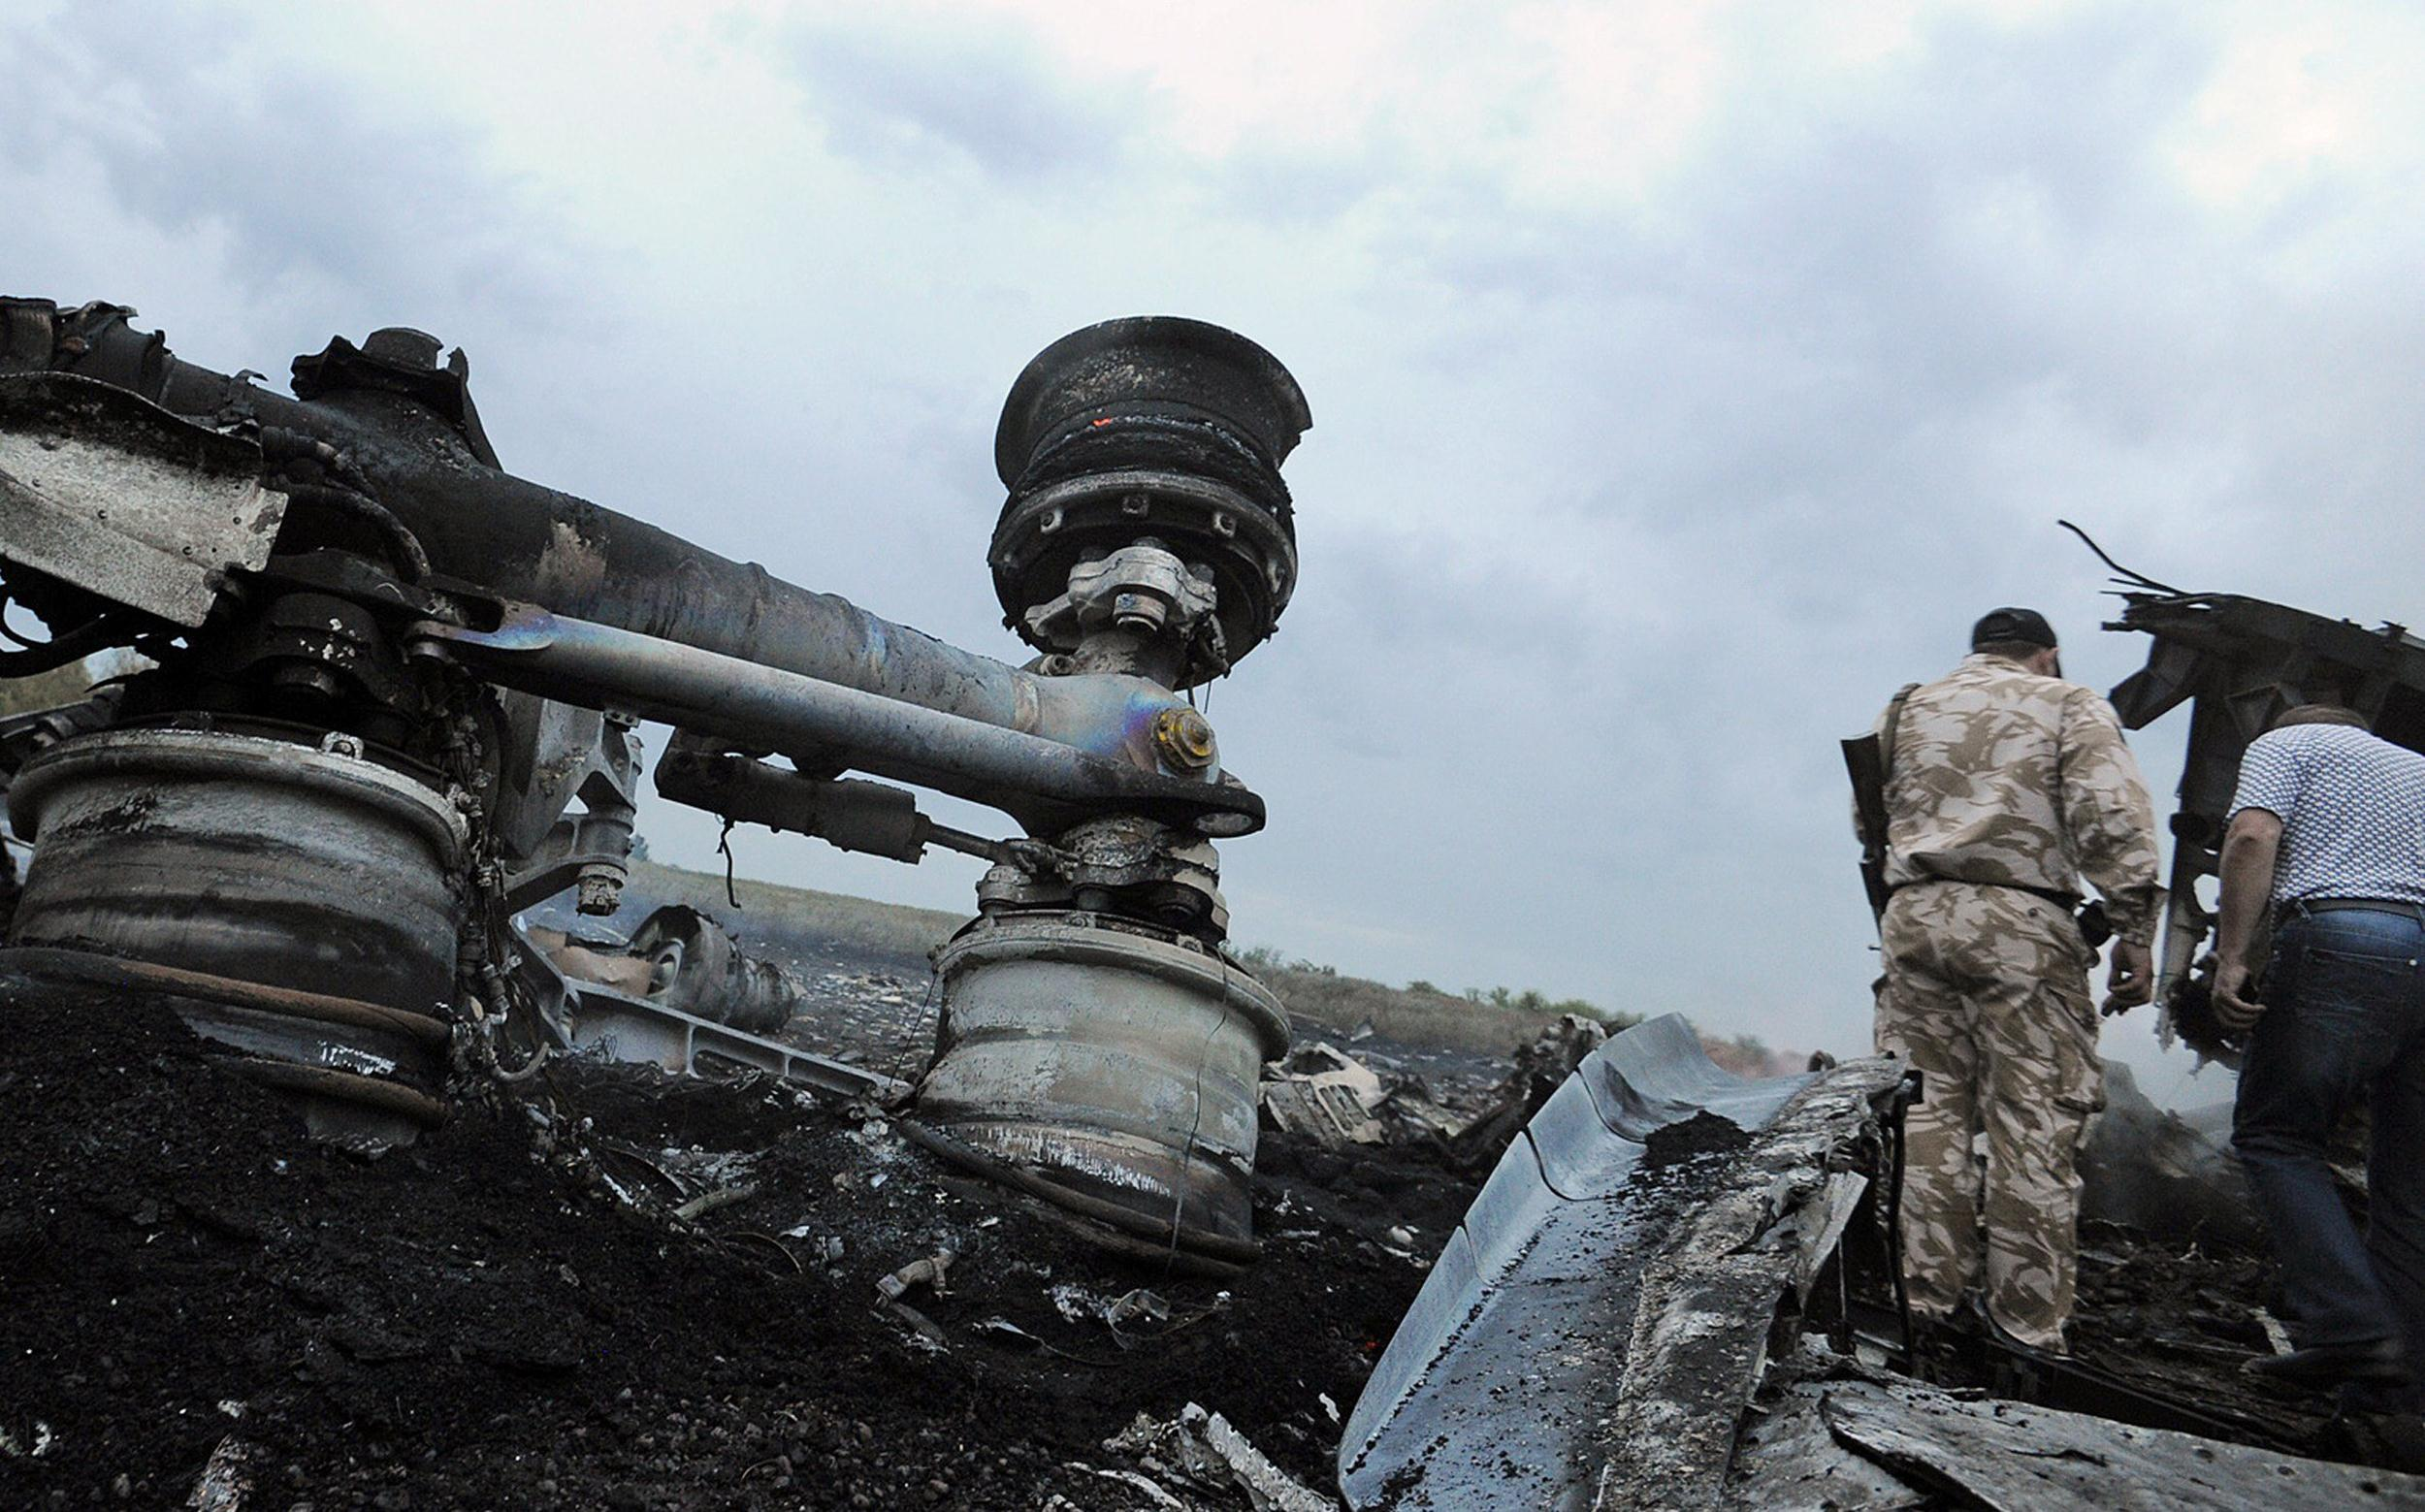 Image: UKRAINE-AVIATION-ACCIDENT-RUSSIA-MALAYSIA